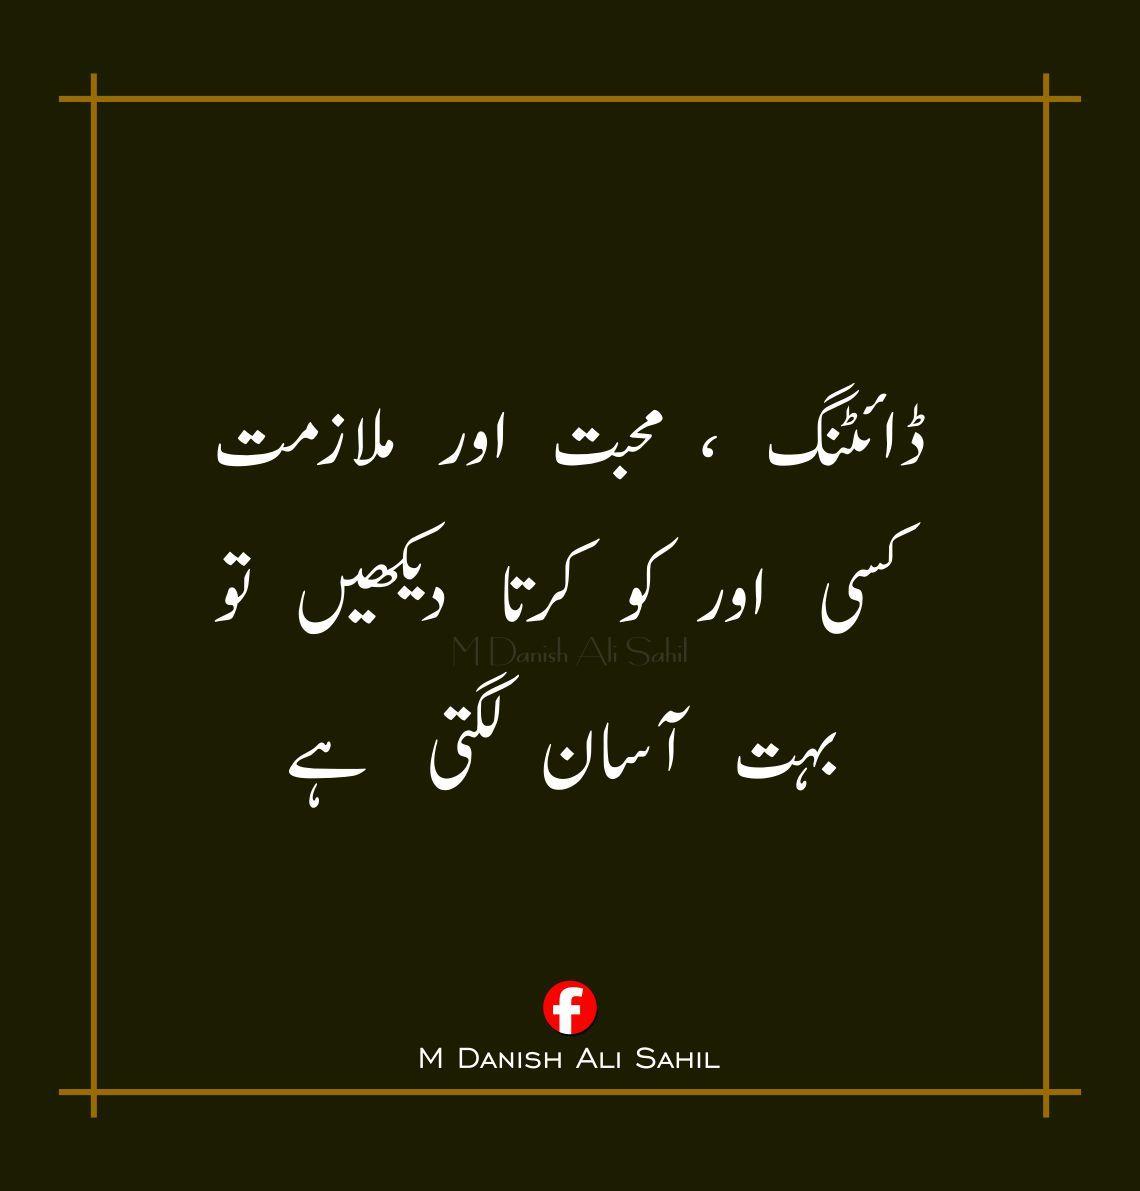 Design Islamic Urdu Quotes Quotes Images Pictures Best Collection Zindagi About Life Best Urdu Ameezing Quotes Islamic Quotes Life Quotes Quotes Deep